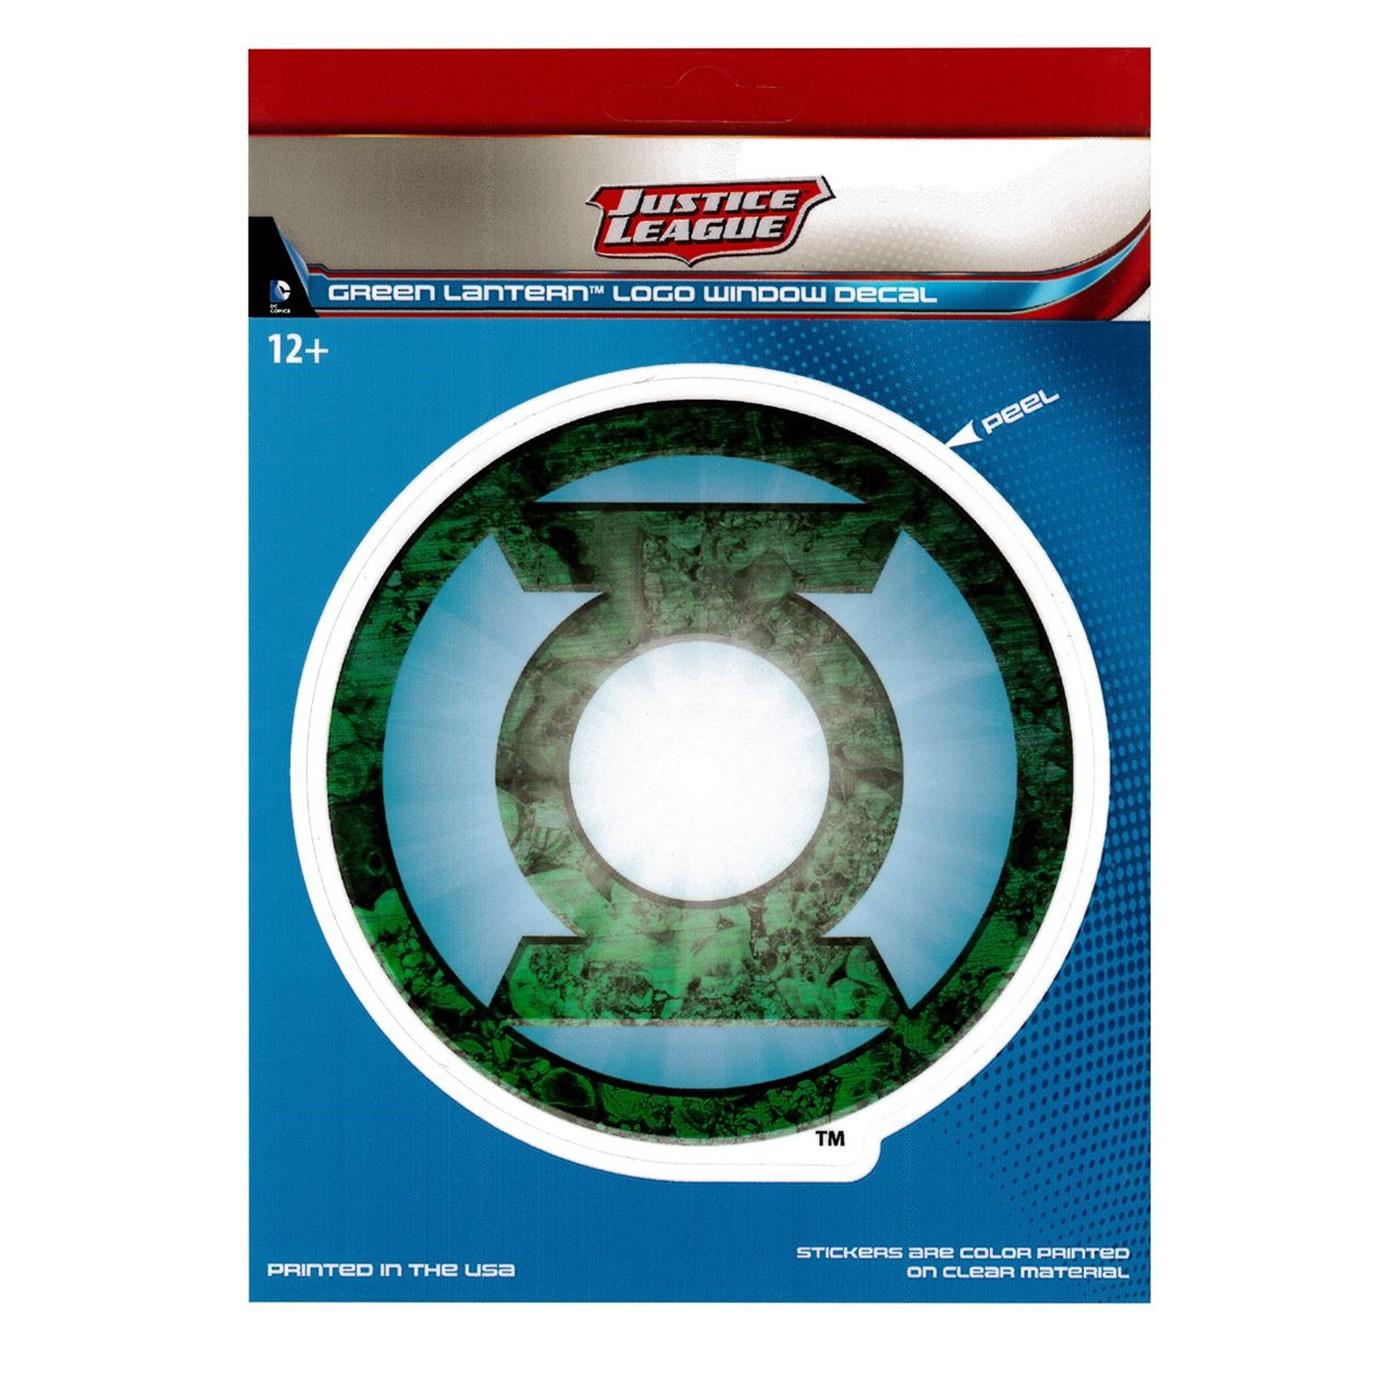 Green Lantern Symbol Car Window Decal